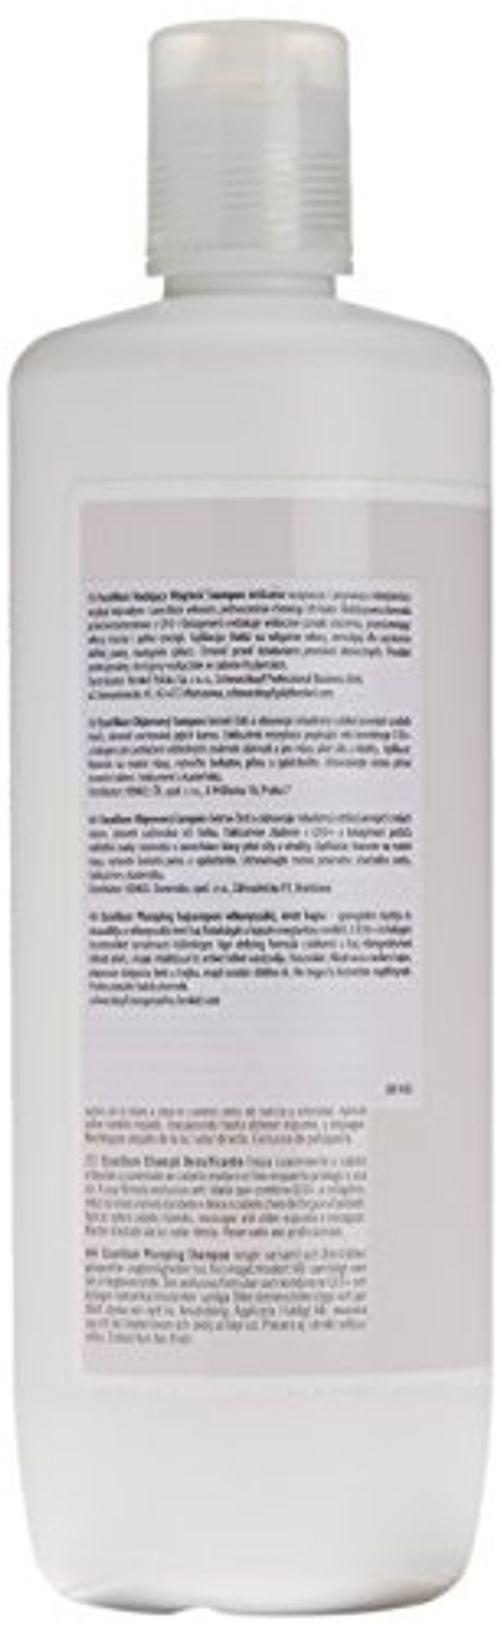 photo Wallpaper of Schwarzkopf-BC EXCELLIUM PLUMPING SHAMPOO 1000ML-